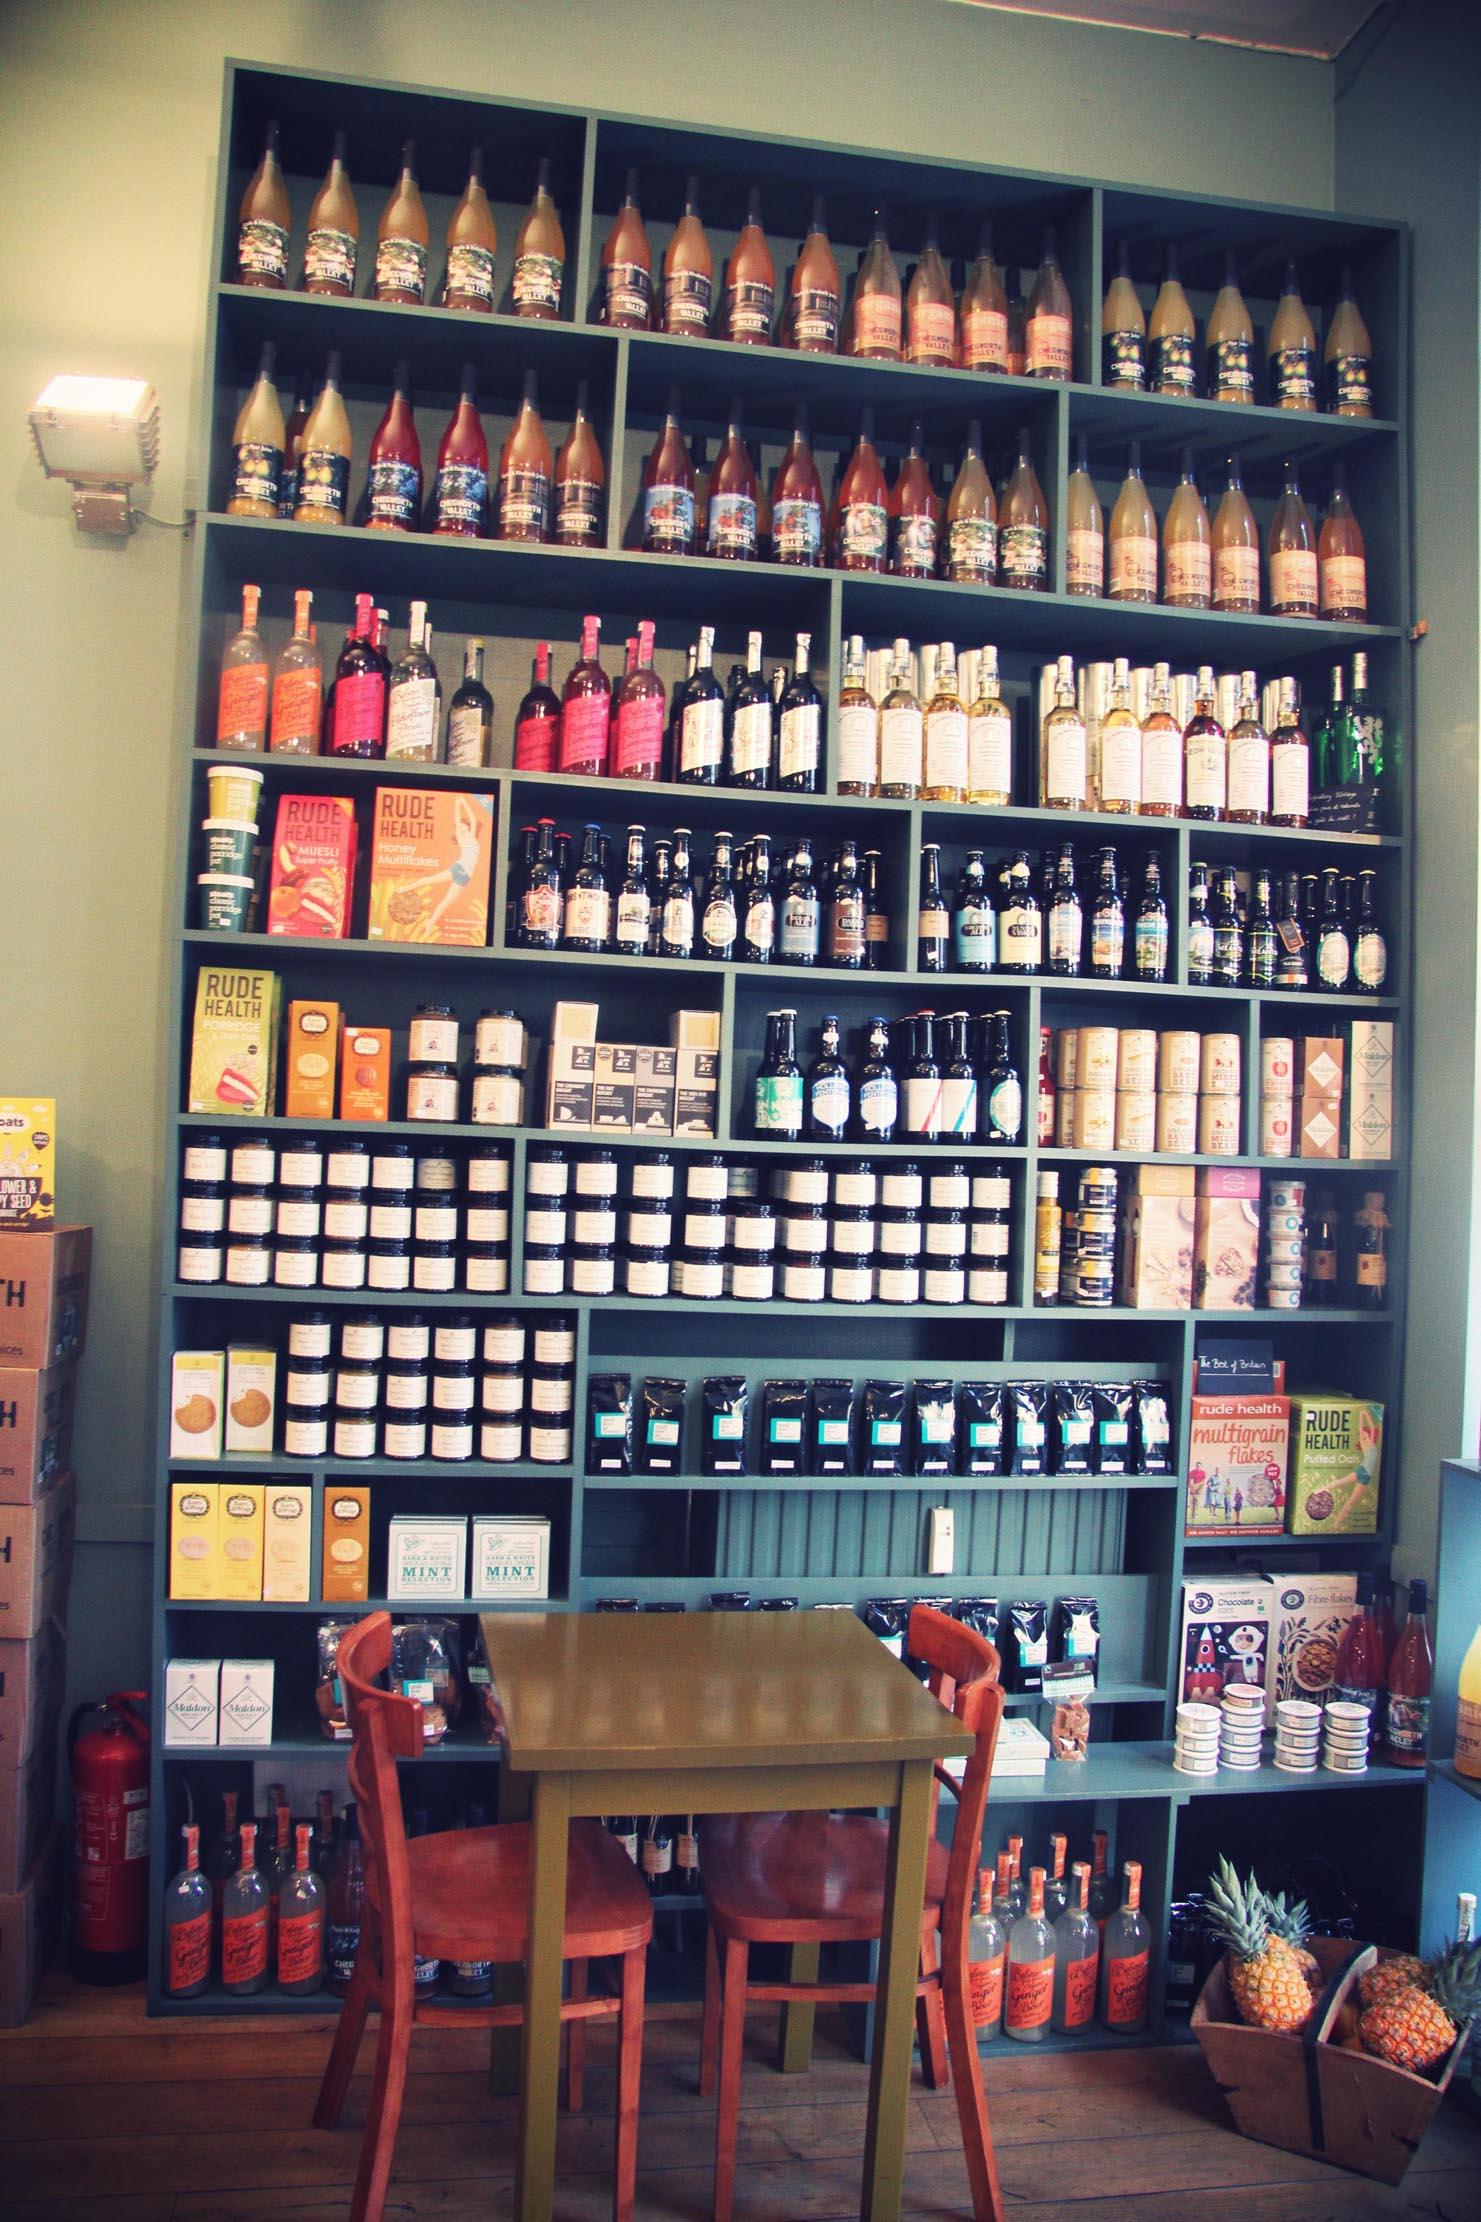 God Save The Cream, à Bruxelles - TravelGuide - www.theflyingflour.com